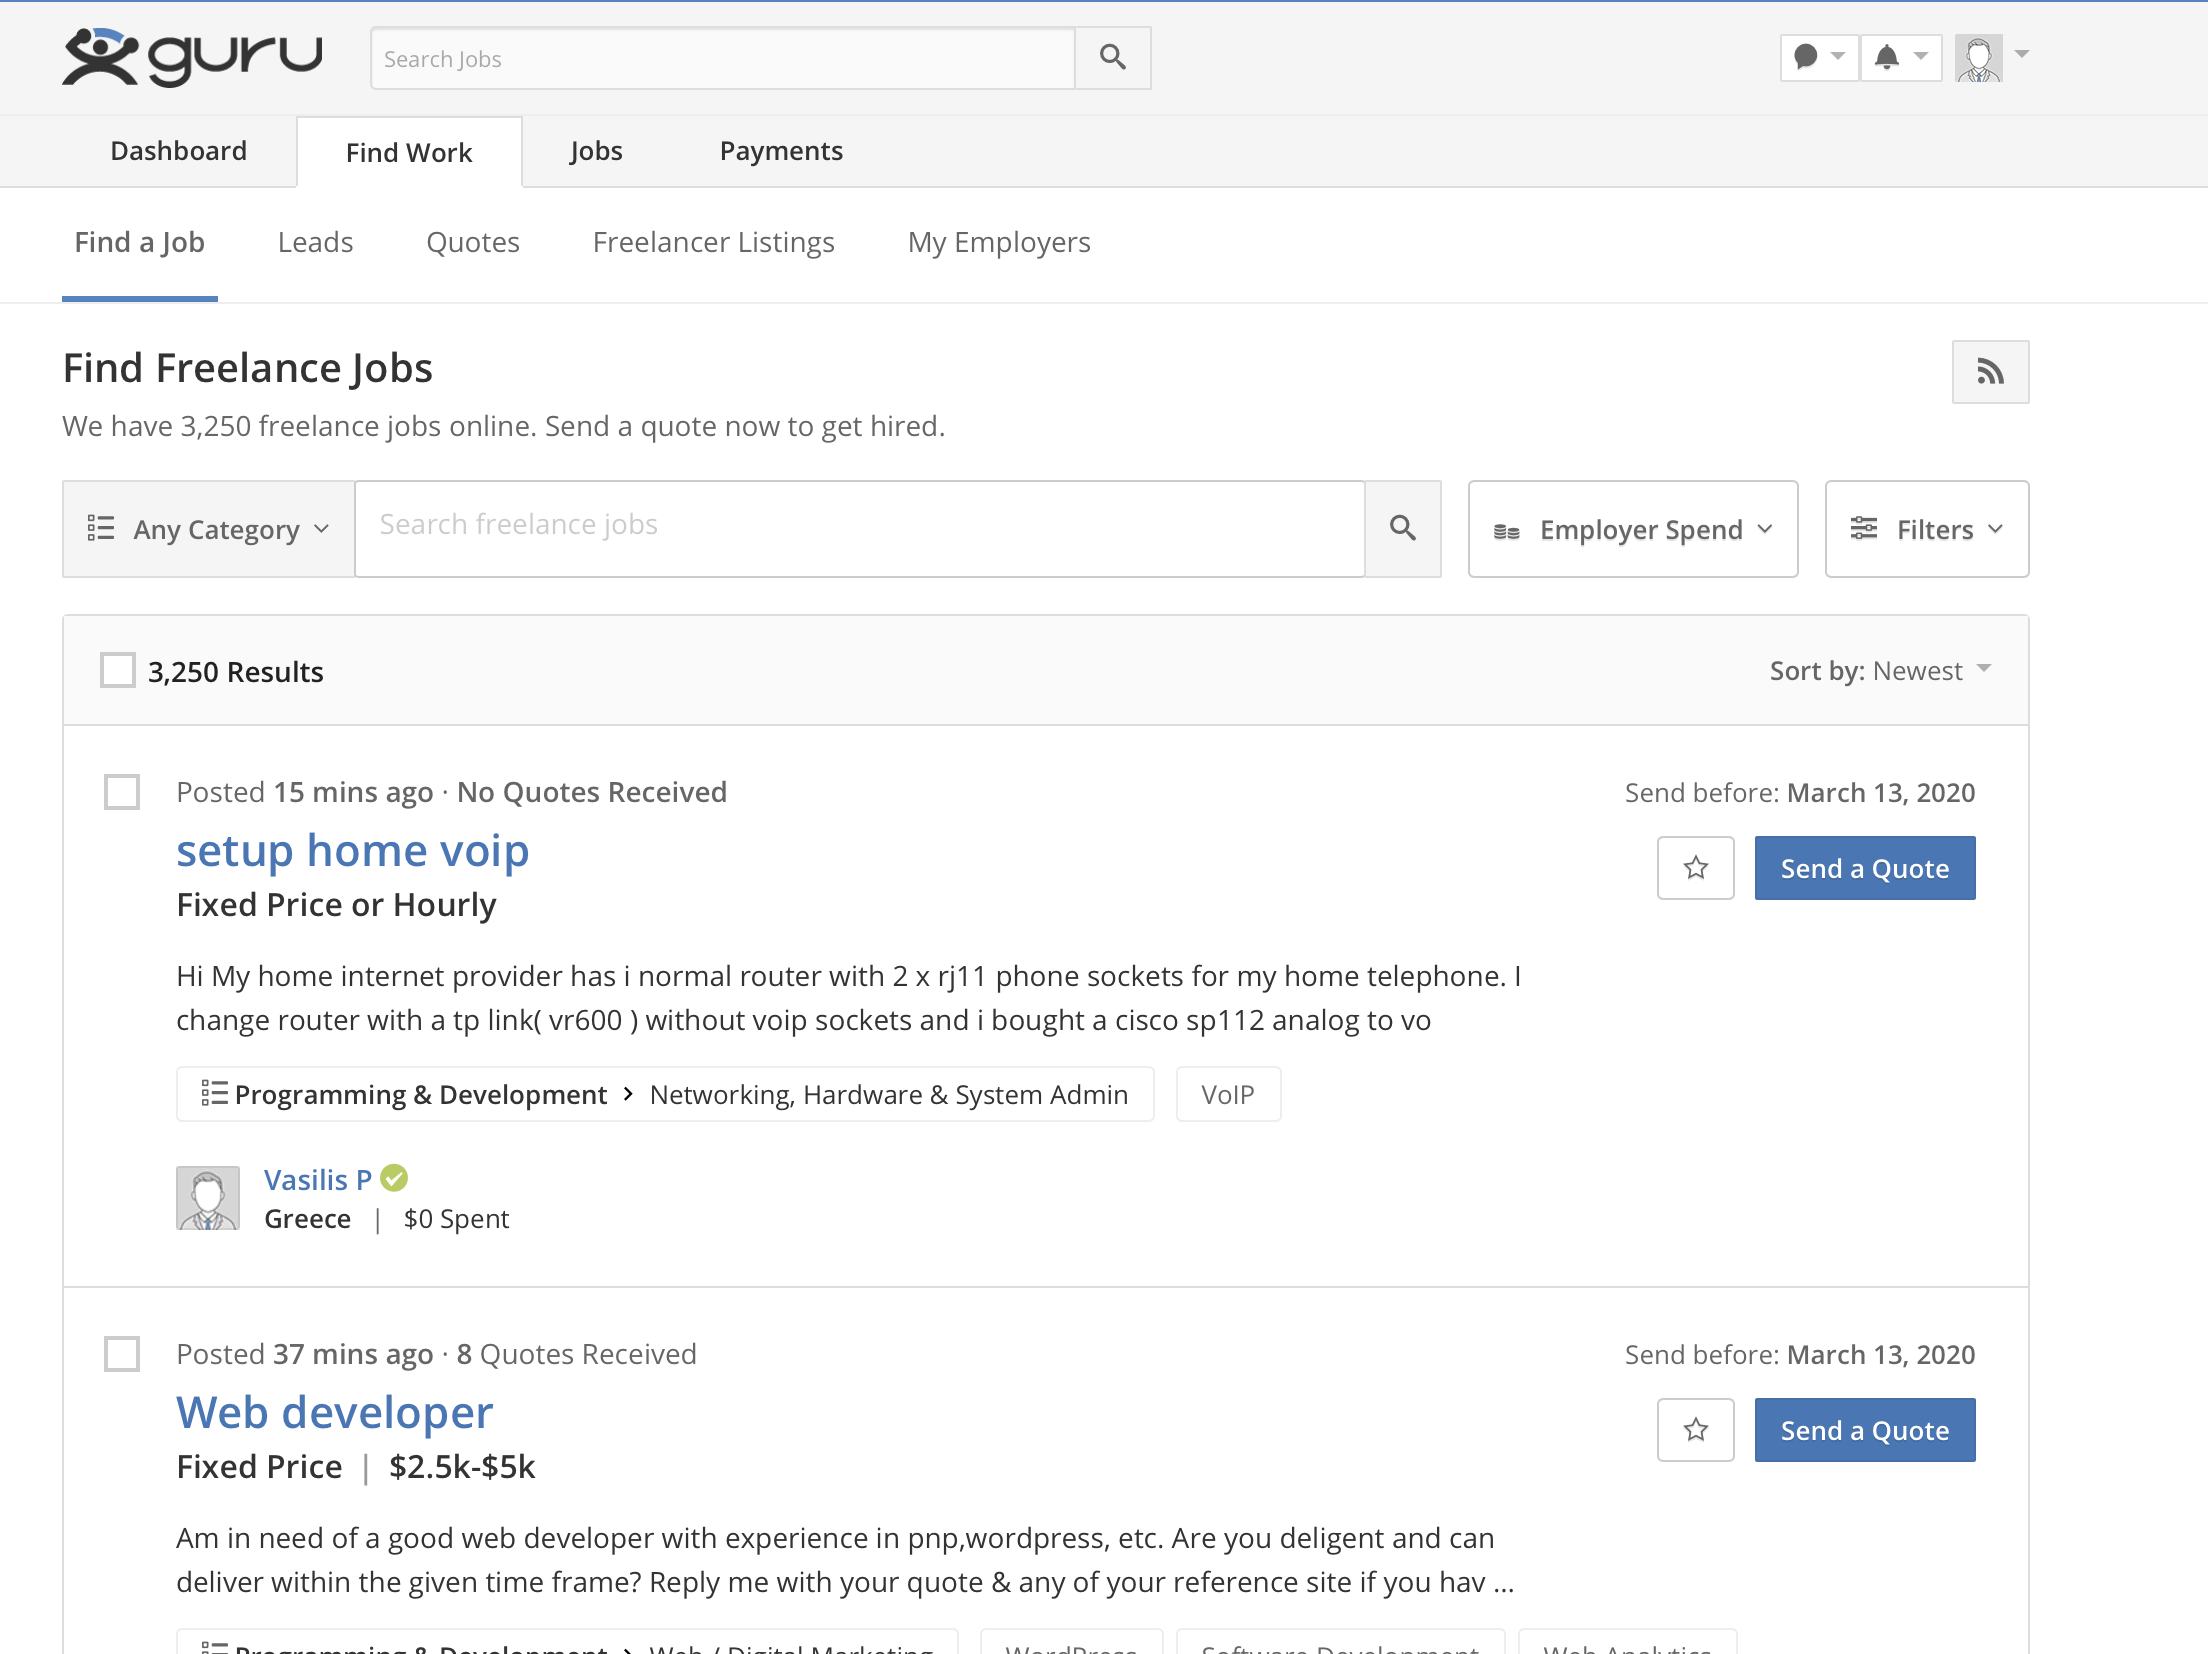 How to Find Job on Guru.com